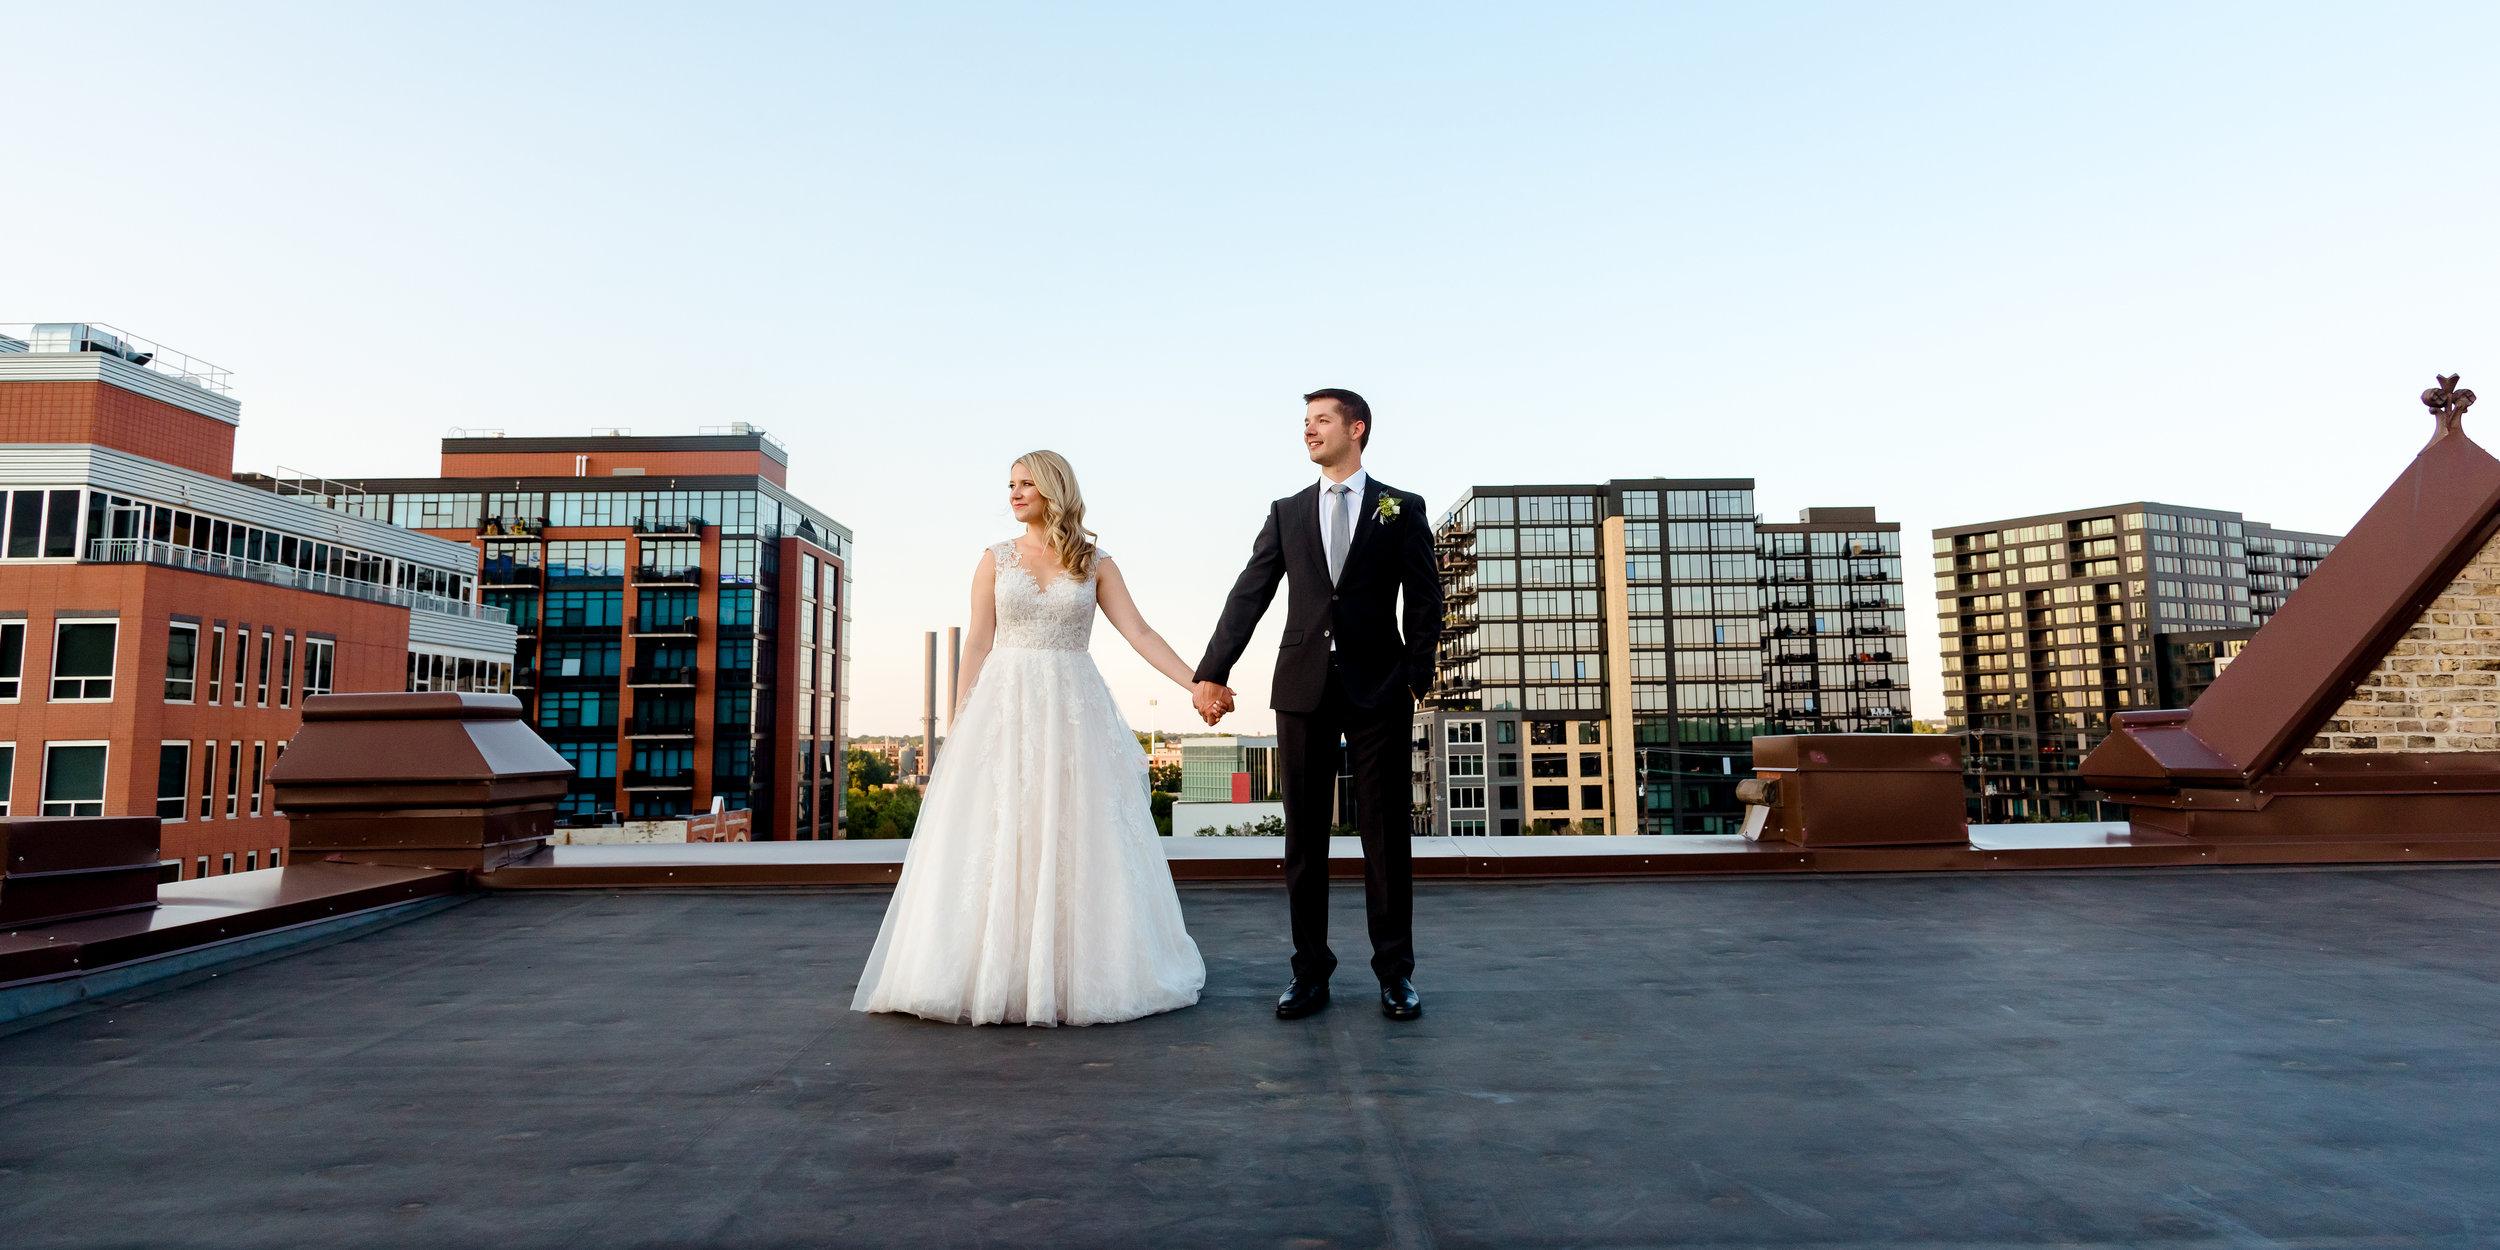 Kristen + Eric - Wedding Album Sample_46.jpg